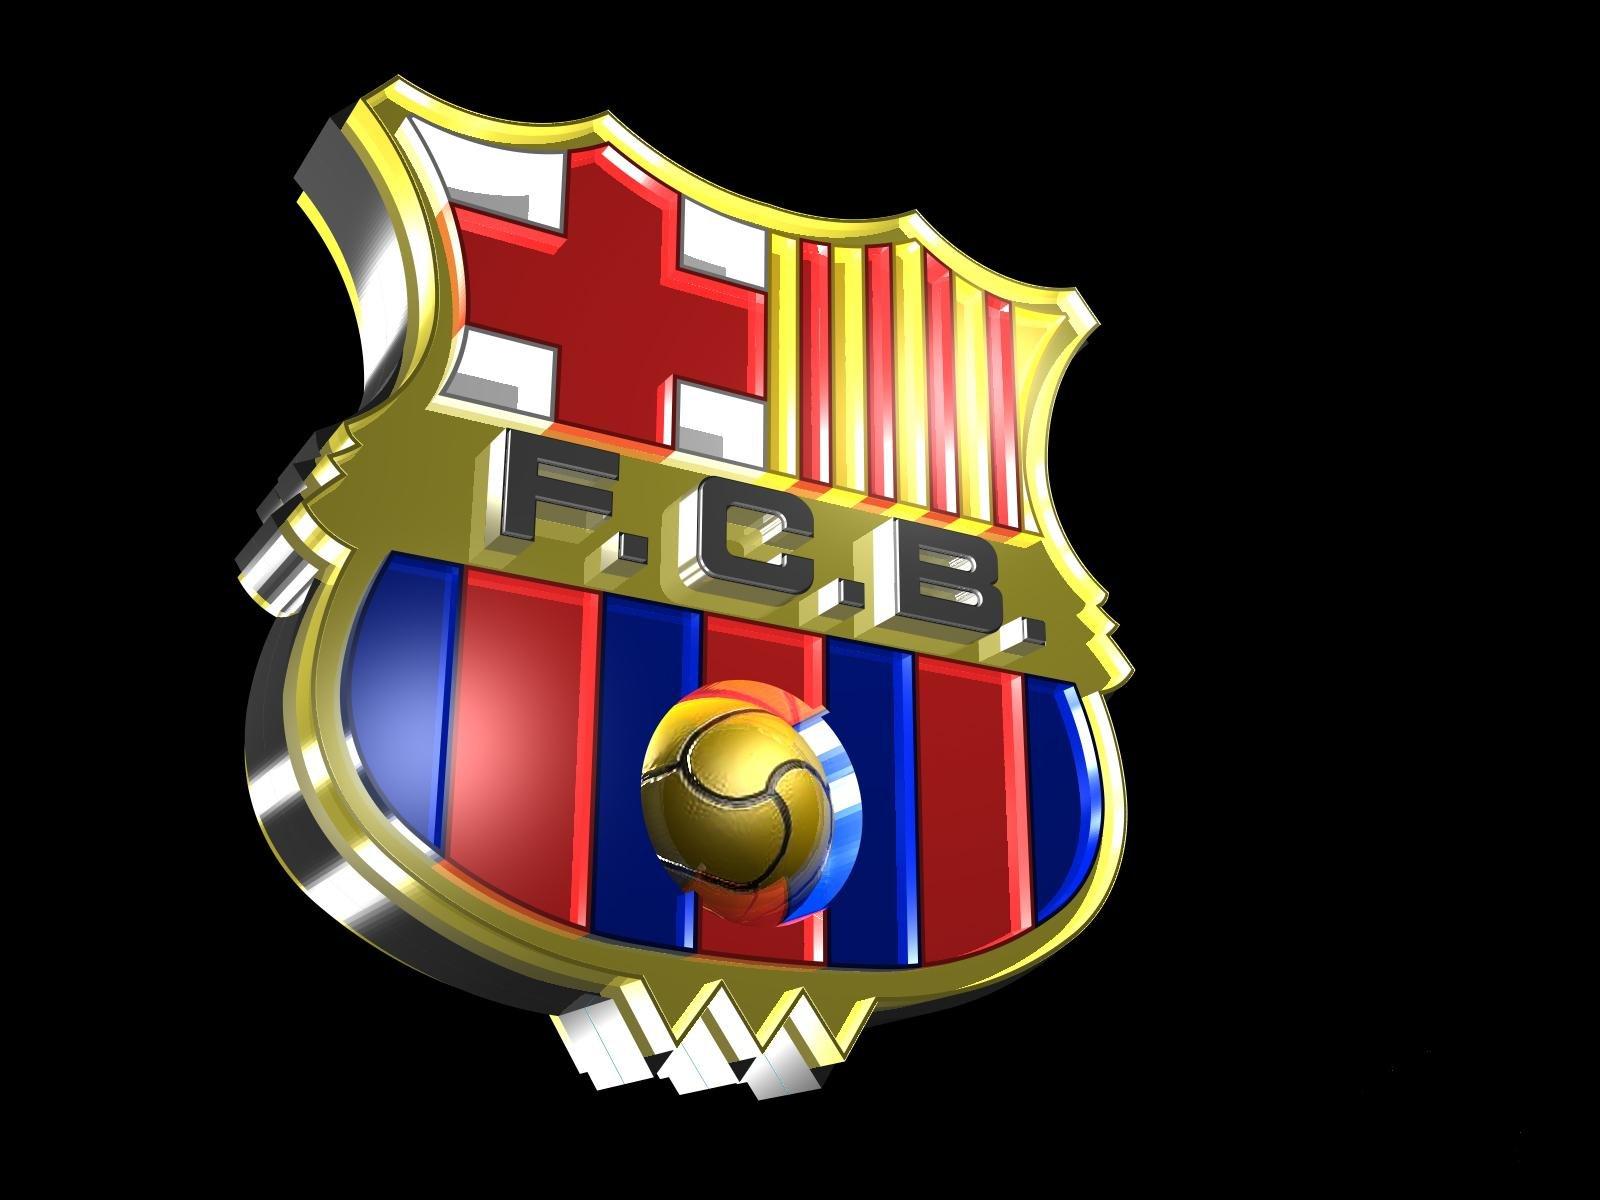 wallpapers hd for mac: Barcelona Football Club Logo Wallpaper HD